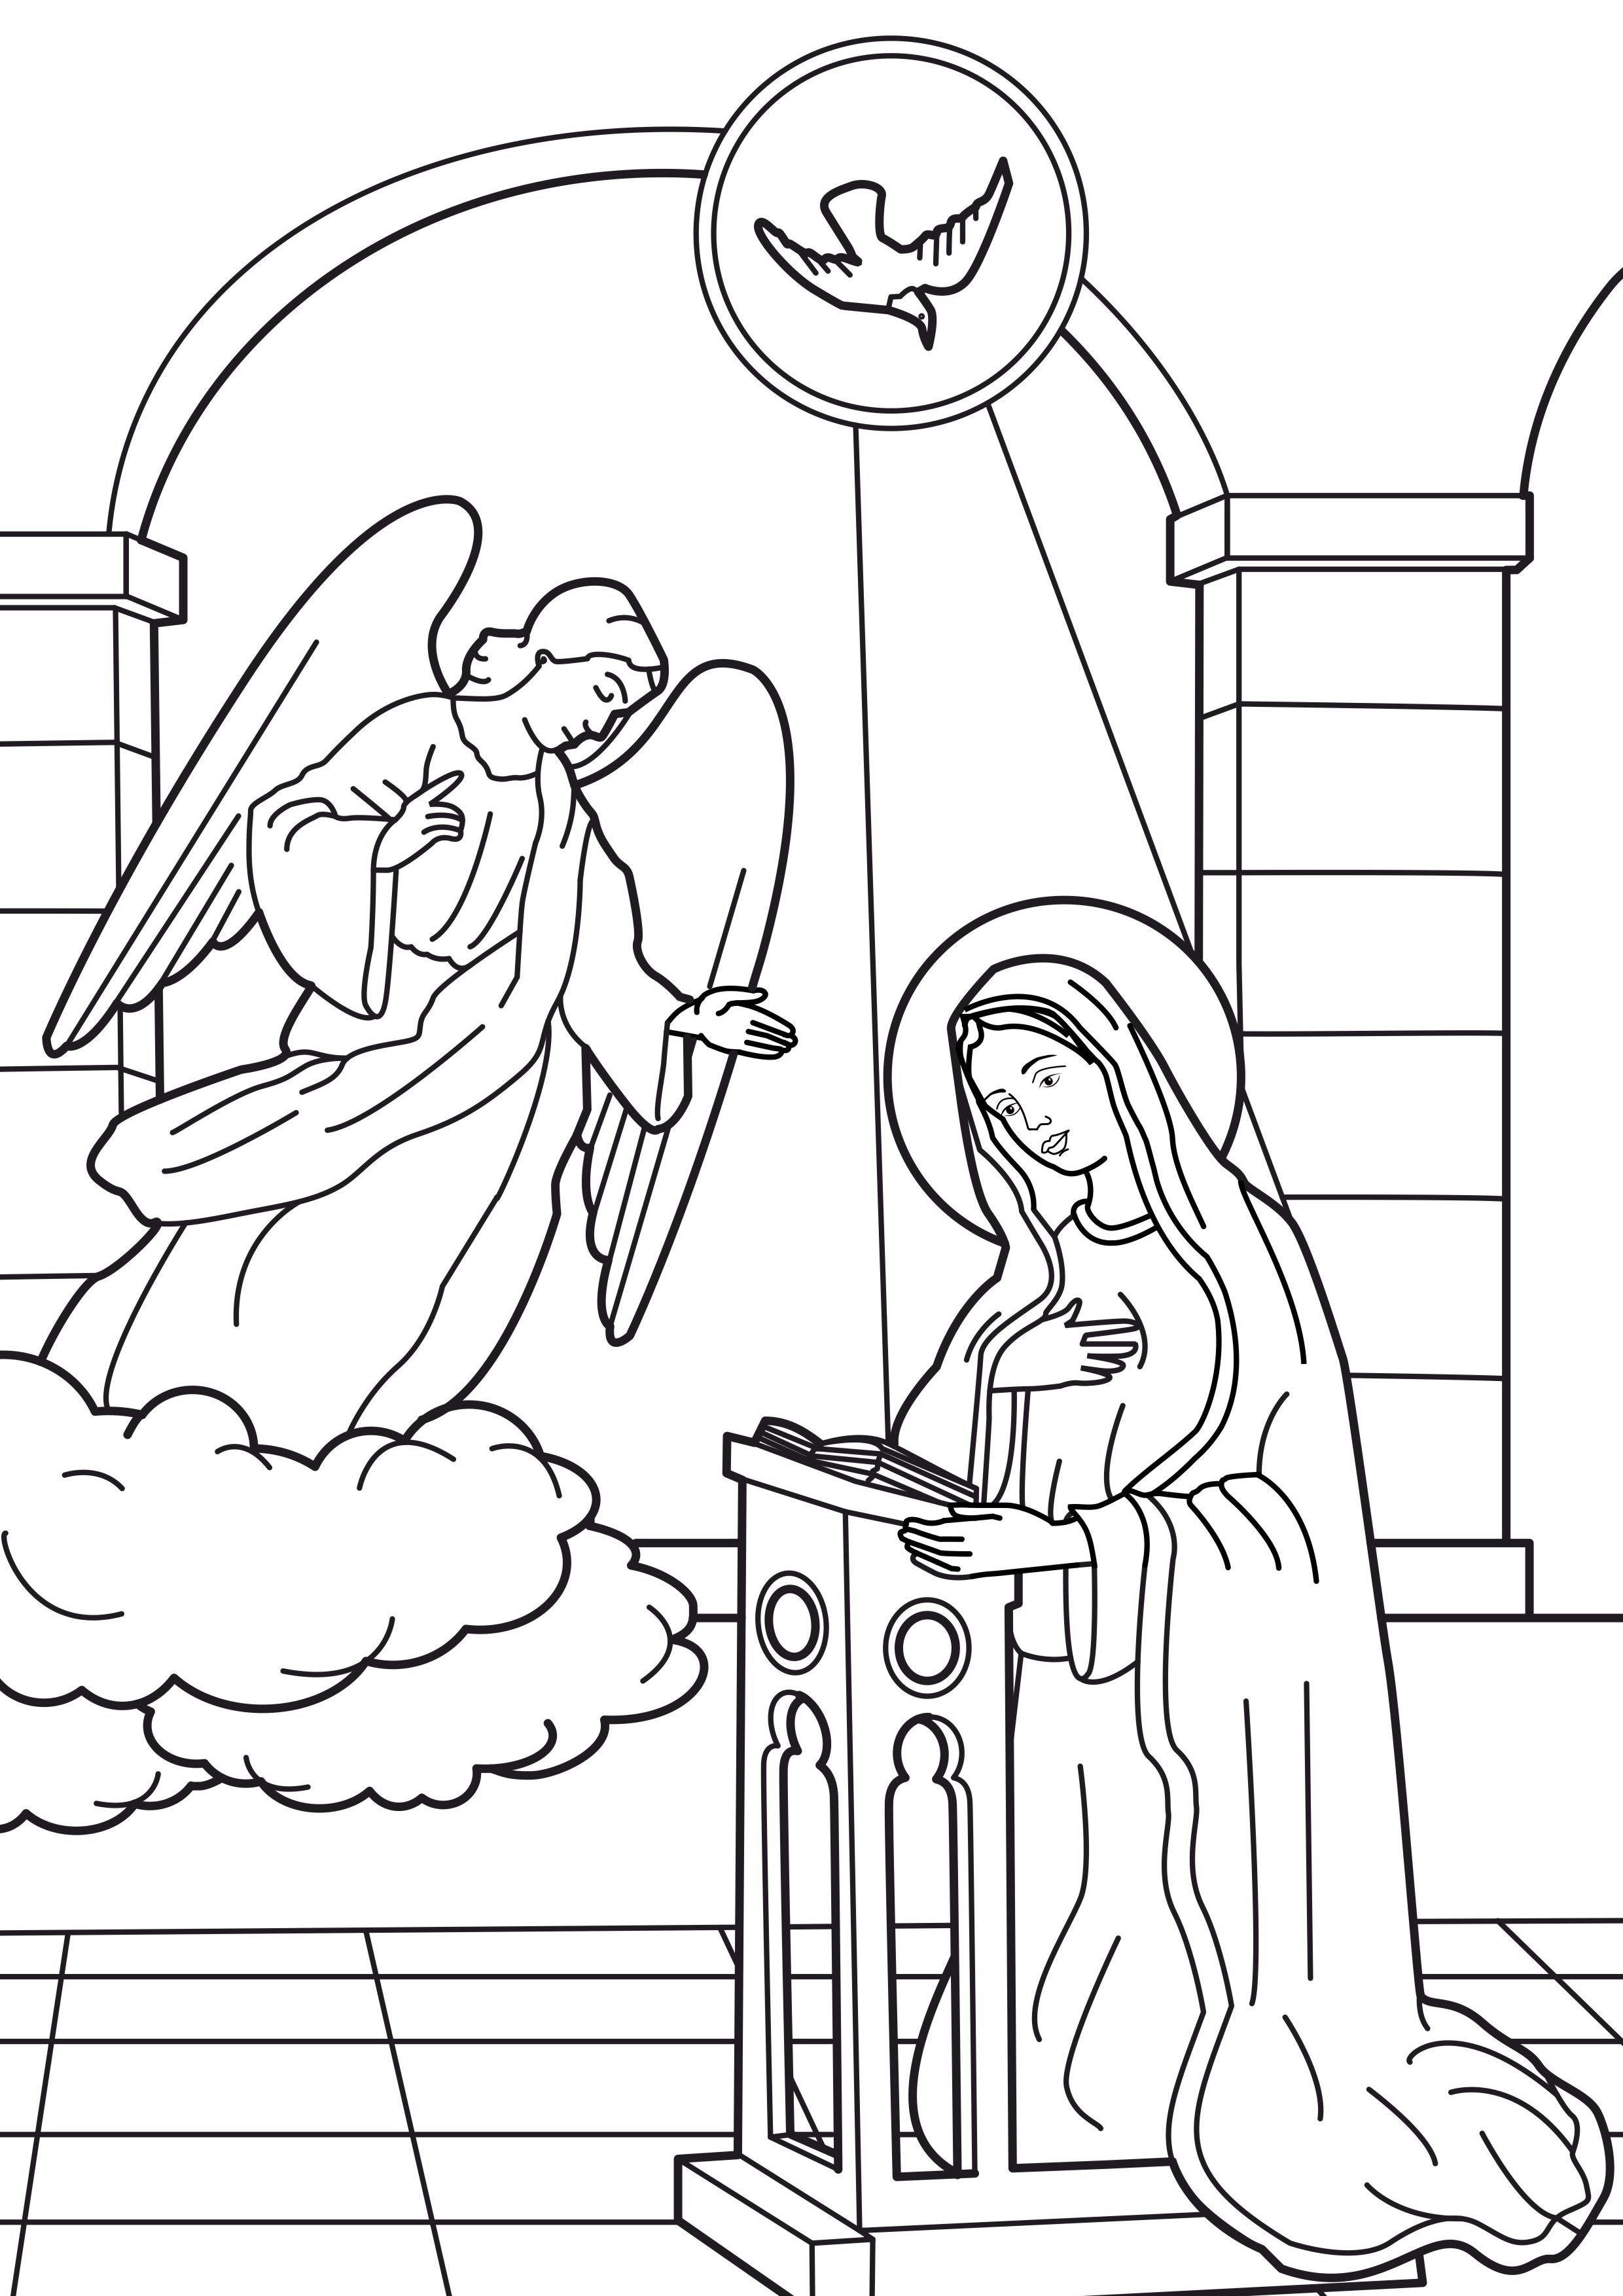 Virgin Mary Coloring Pages Virgen Maria Para Ninos La Anunciacion De Maria Anunciacion De La Virgen Maria